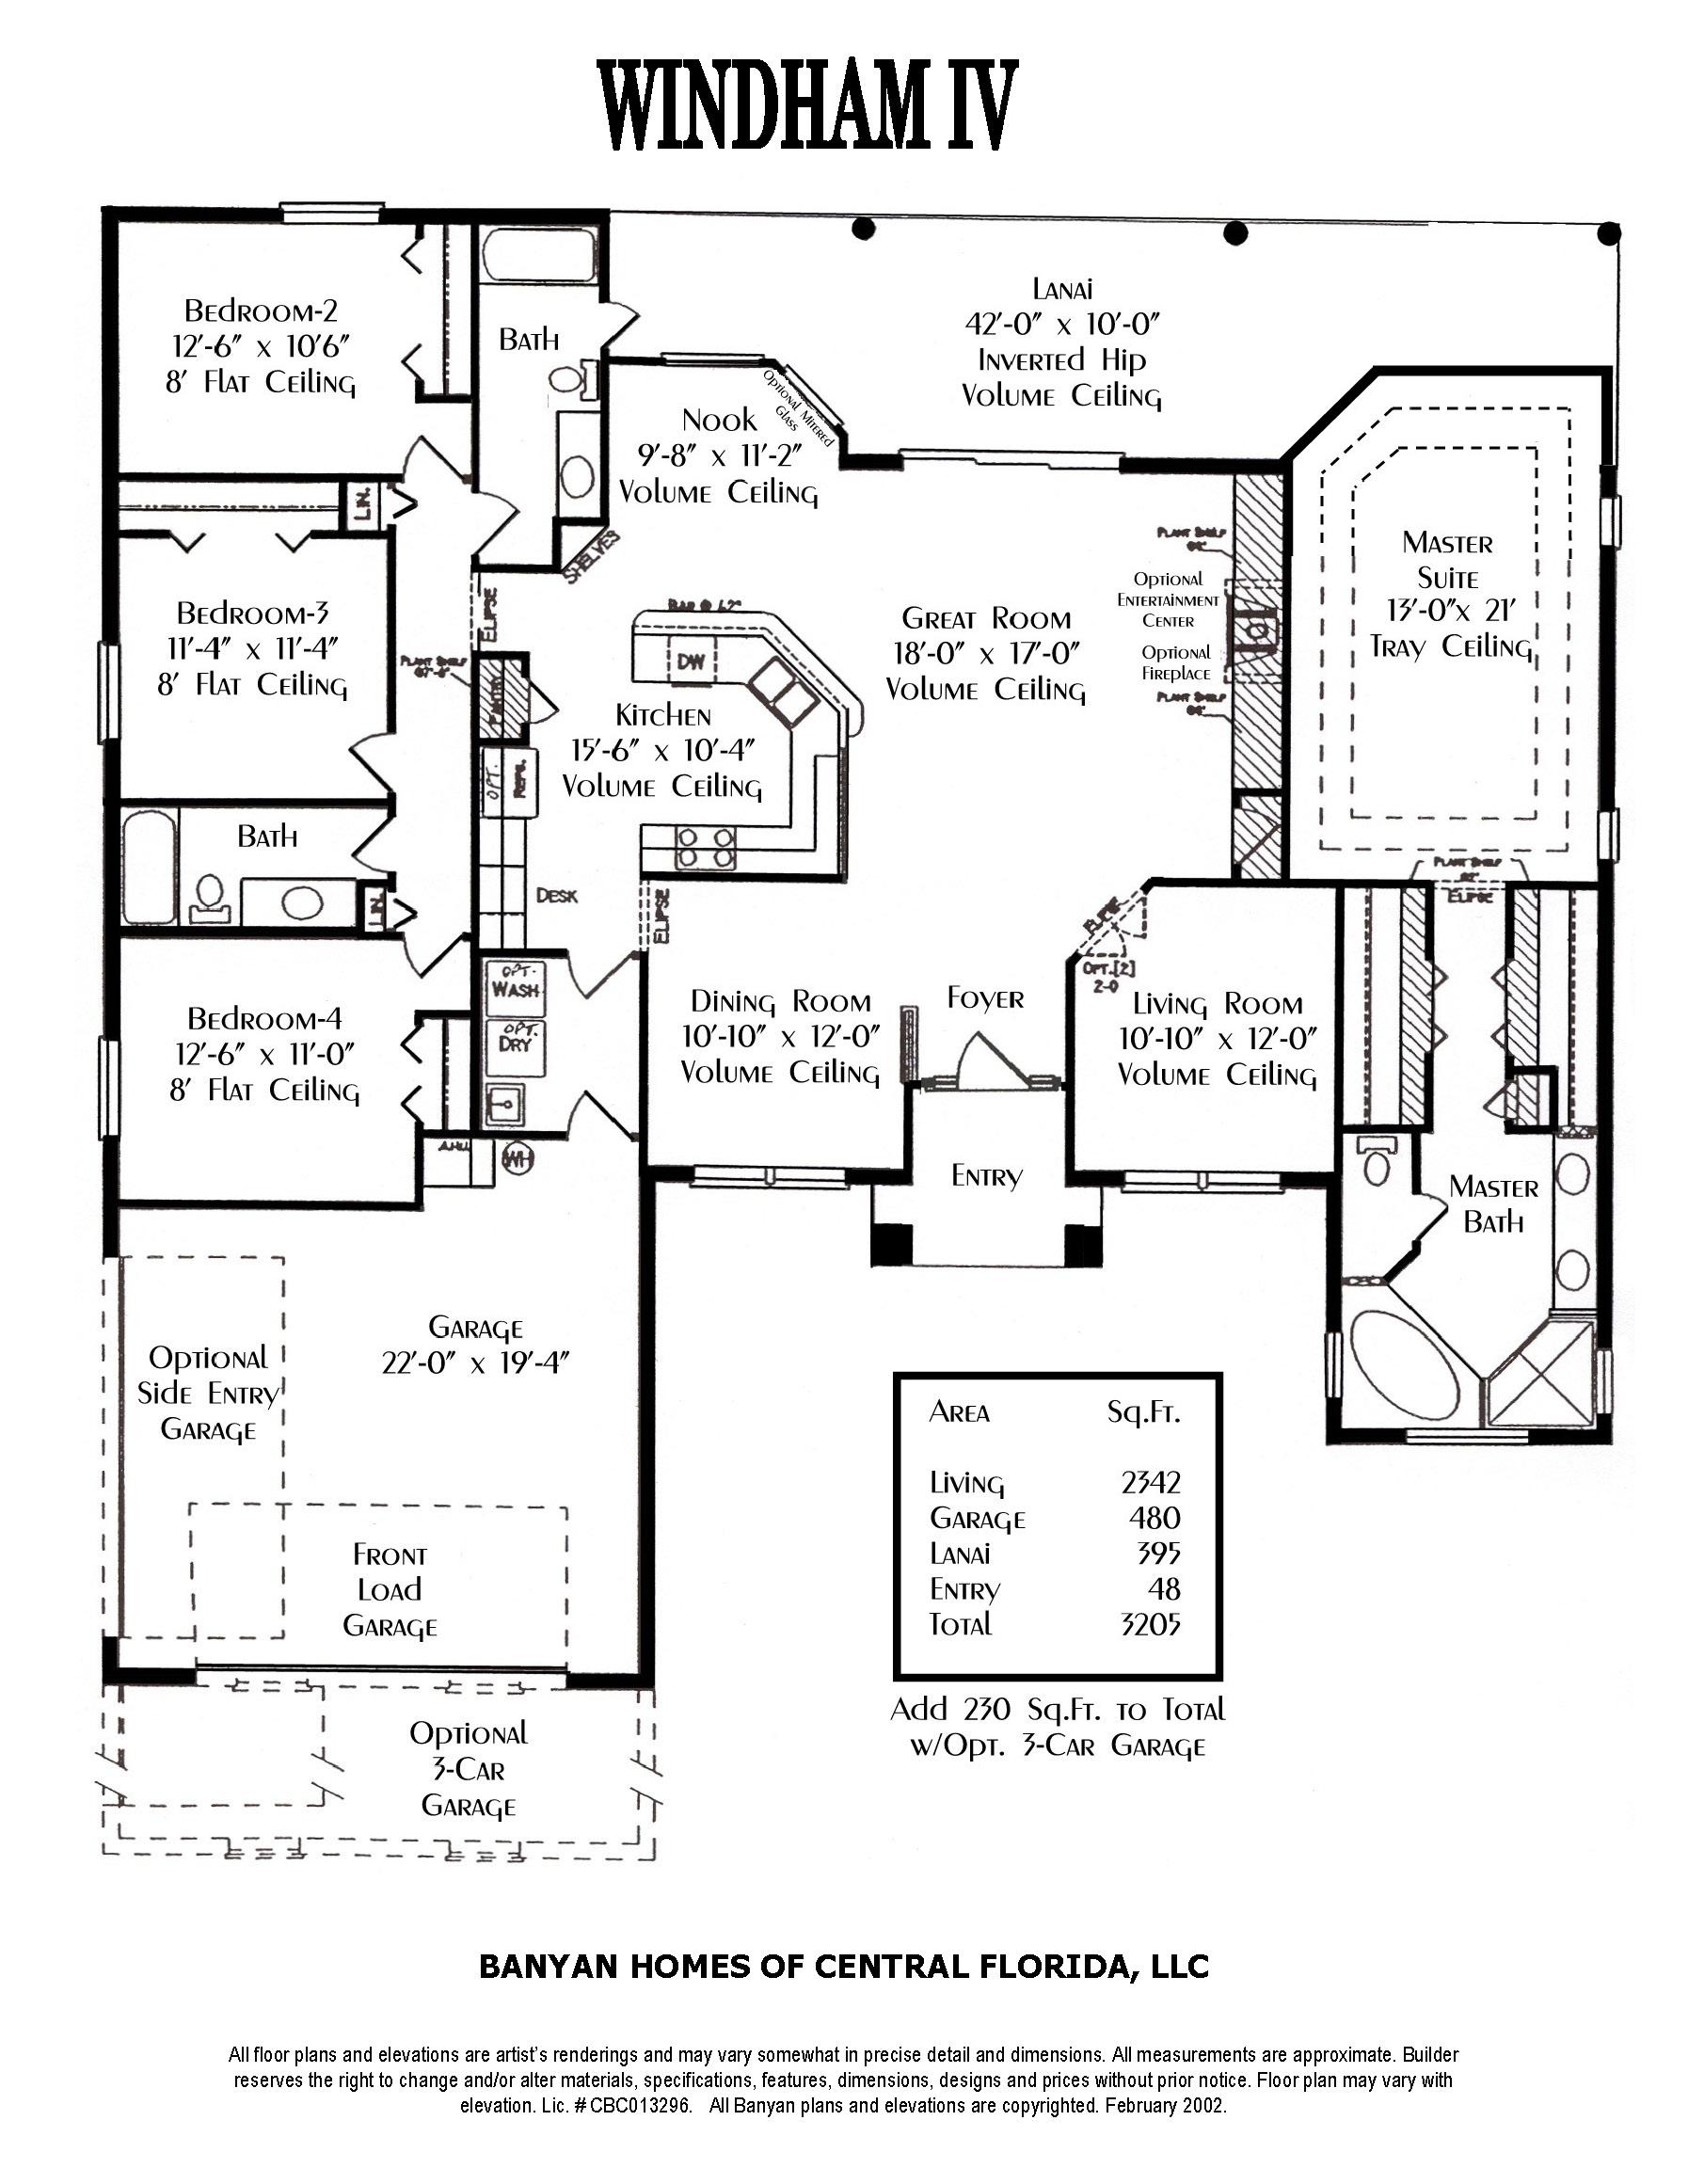 home design 4 bedroom 3 bath 2 story house plans decorating double windham iv 4 bedroom 3 bath